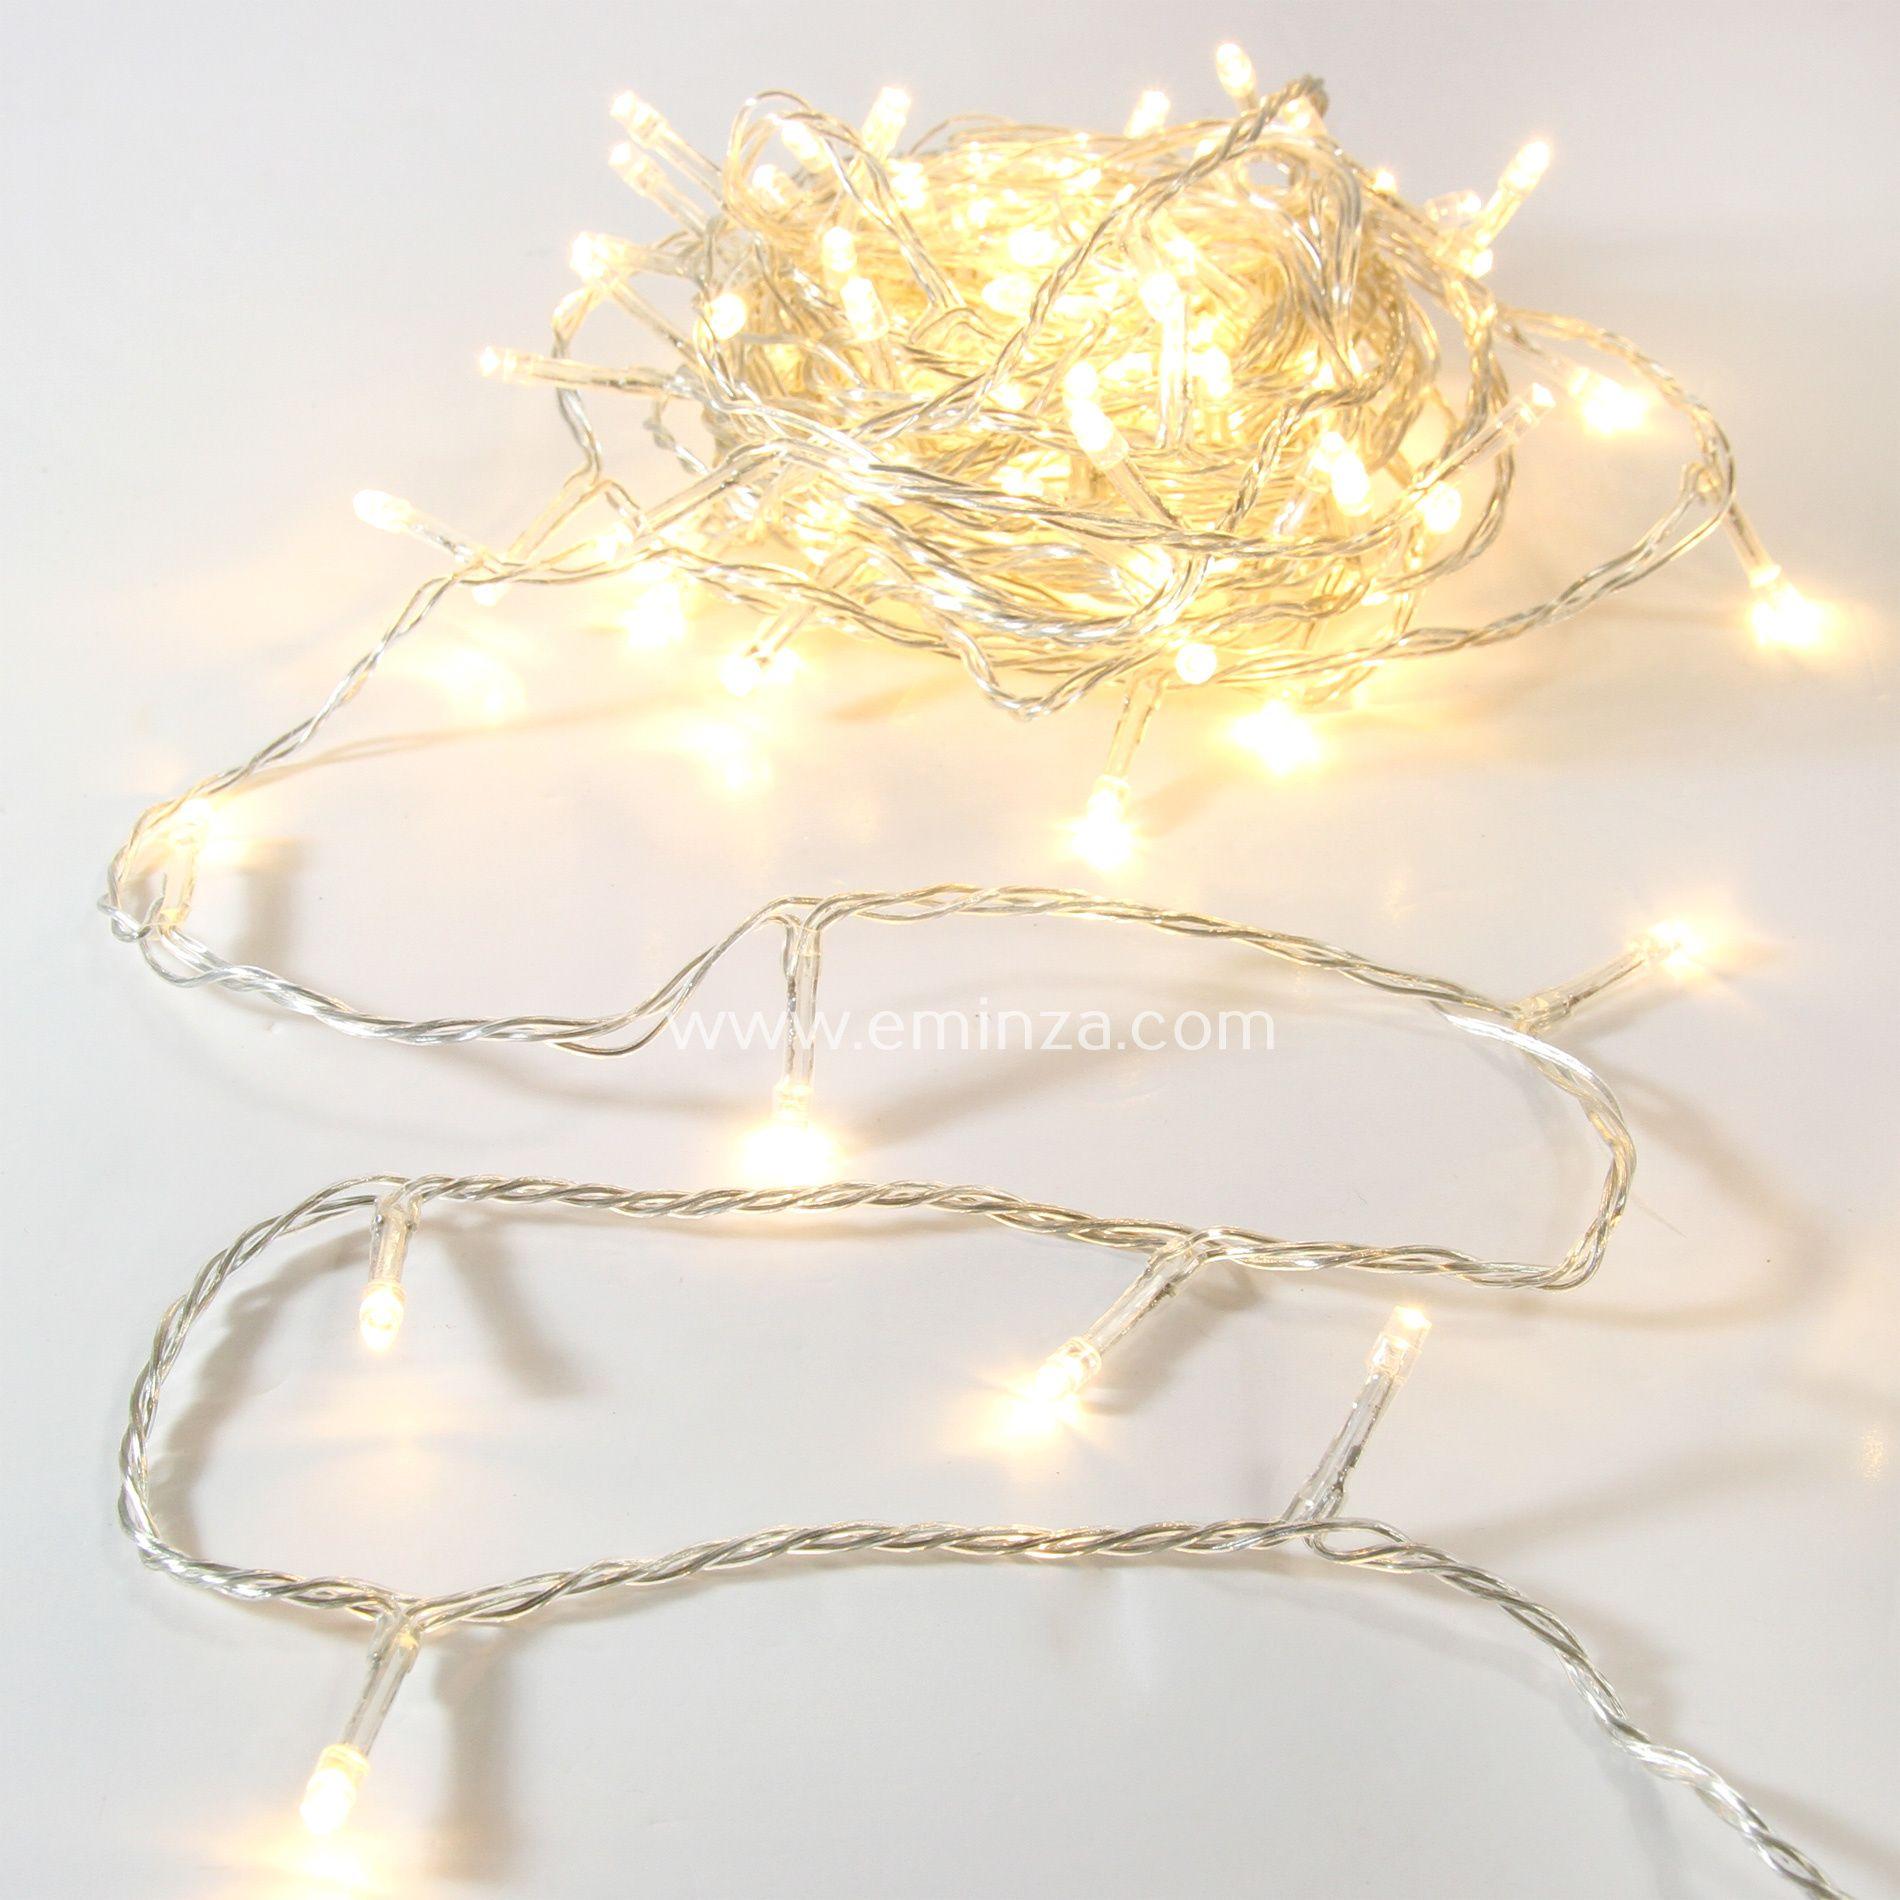 Guirlande lumineuse Timer 10 m Blanc chaud 100 LED CT